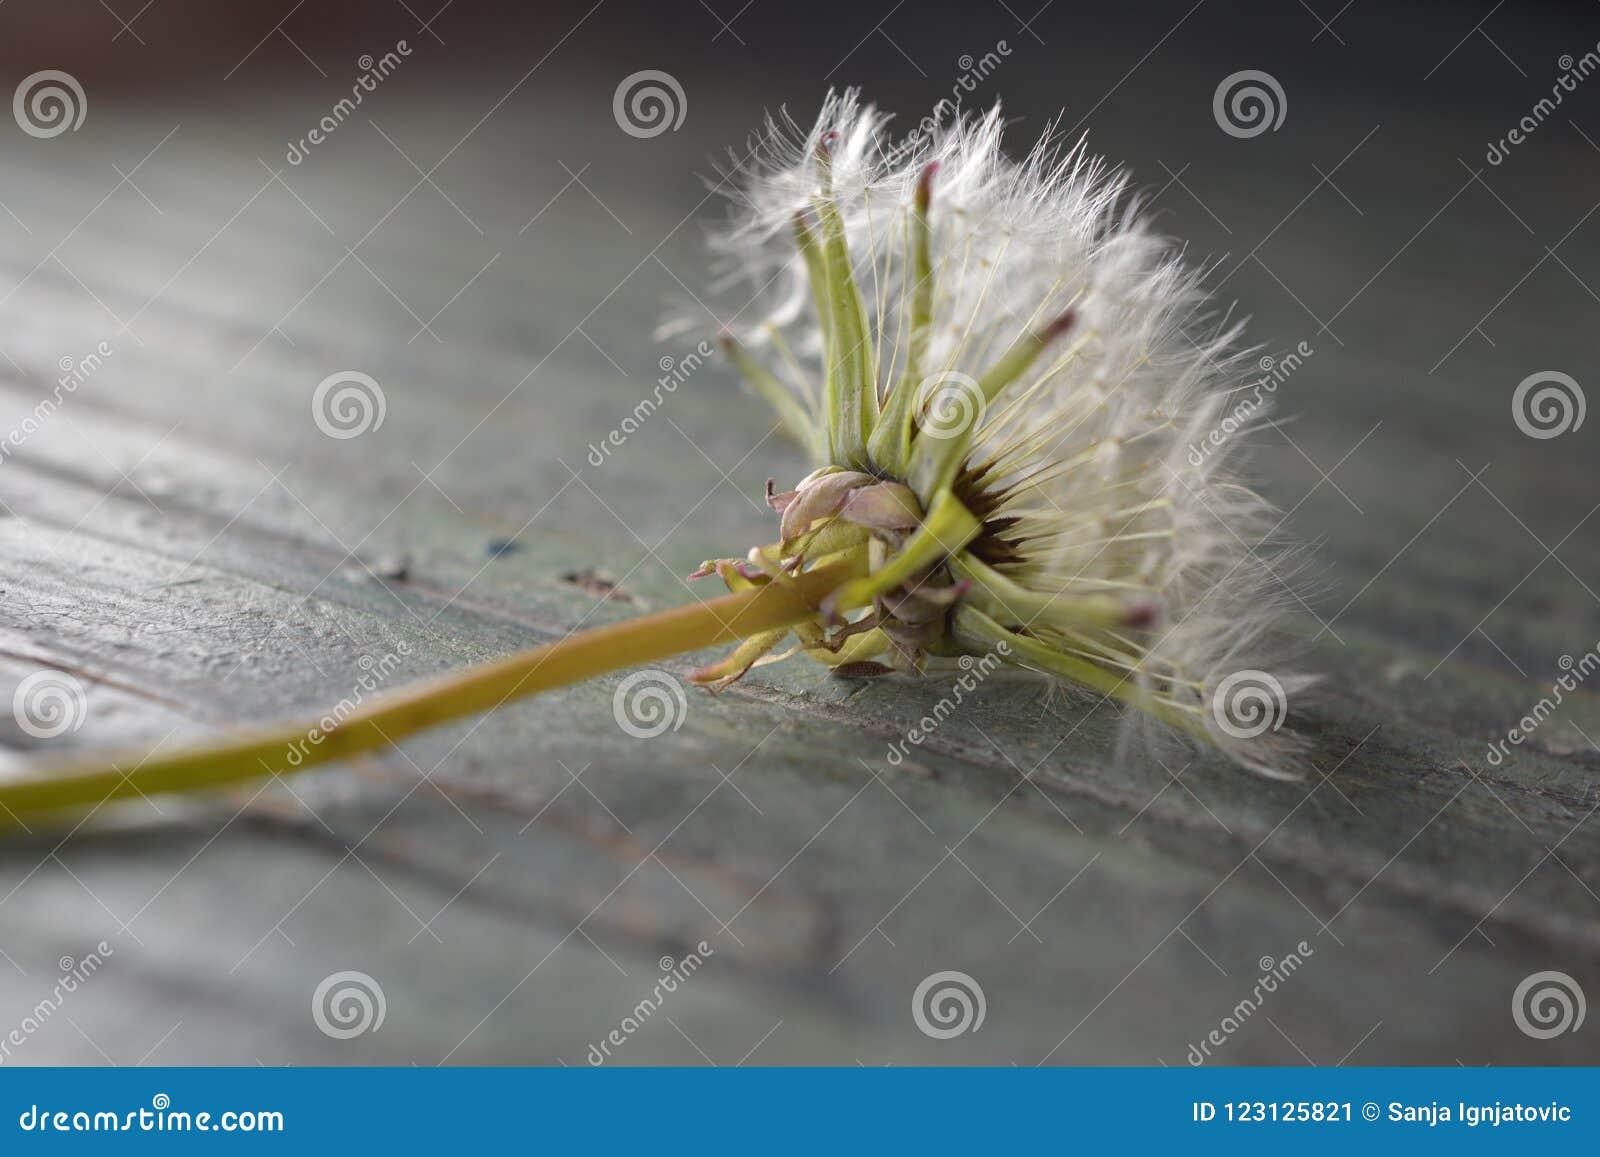 Dandelion on a table